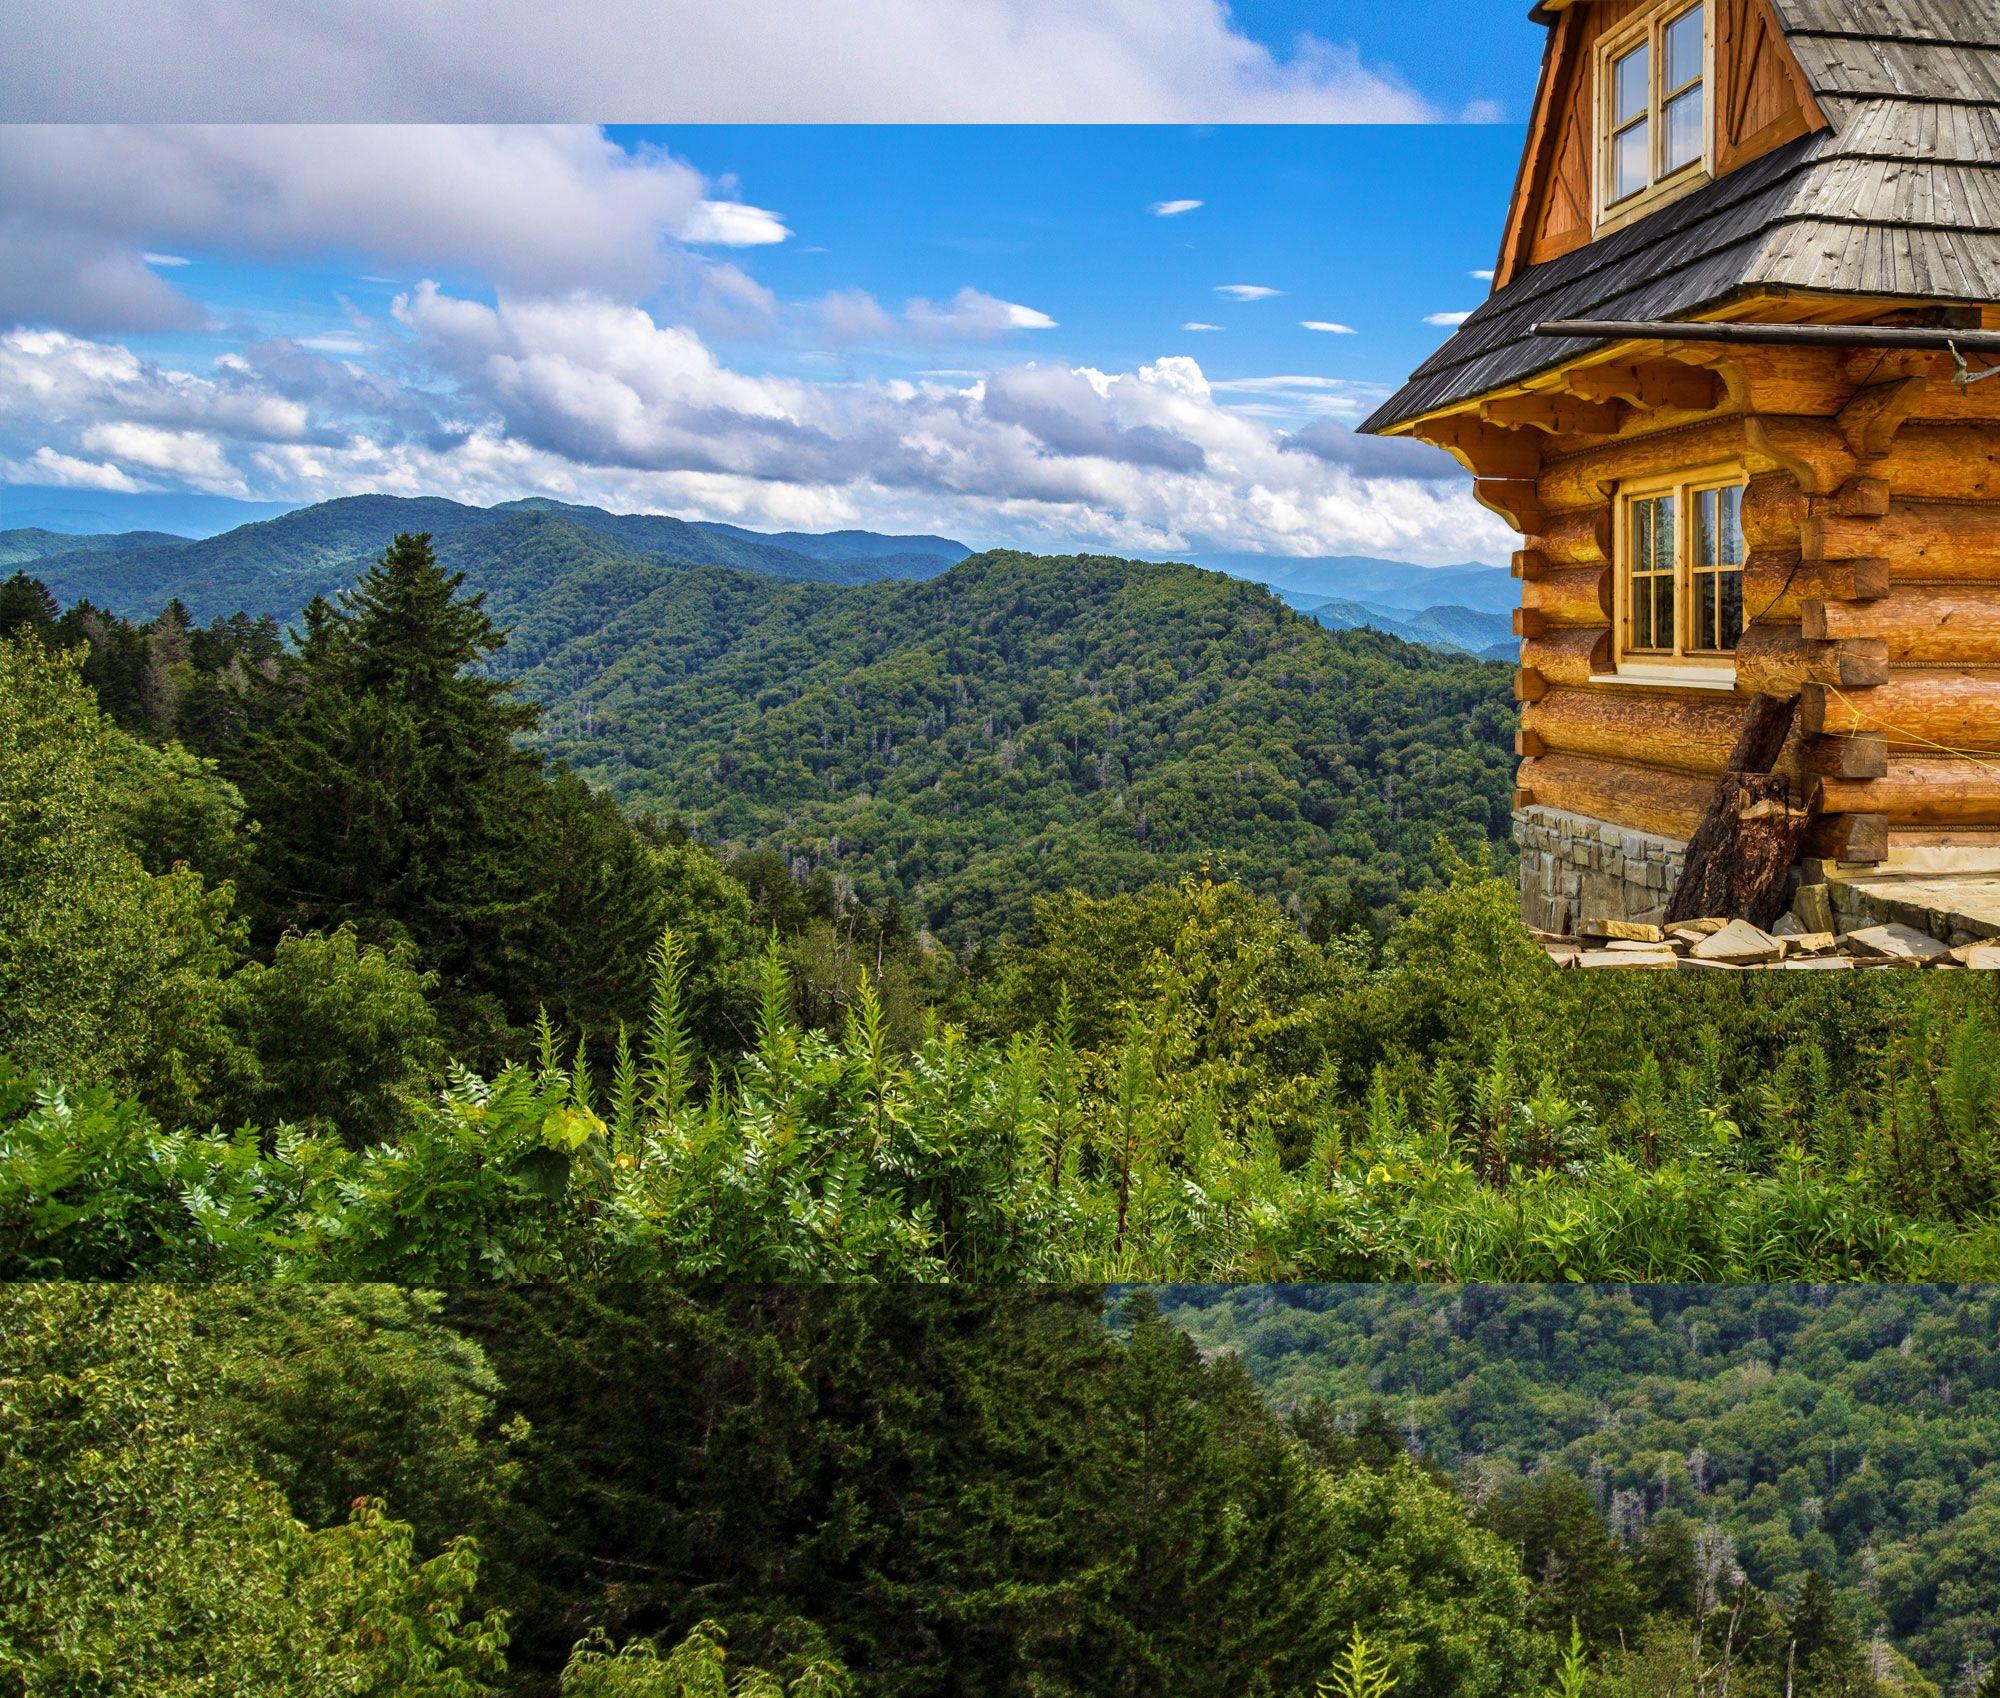 Smoky Mountain Cabin Rentals In Gatlinburg, Pigeon Forge